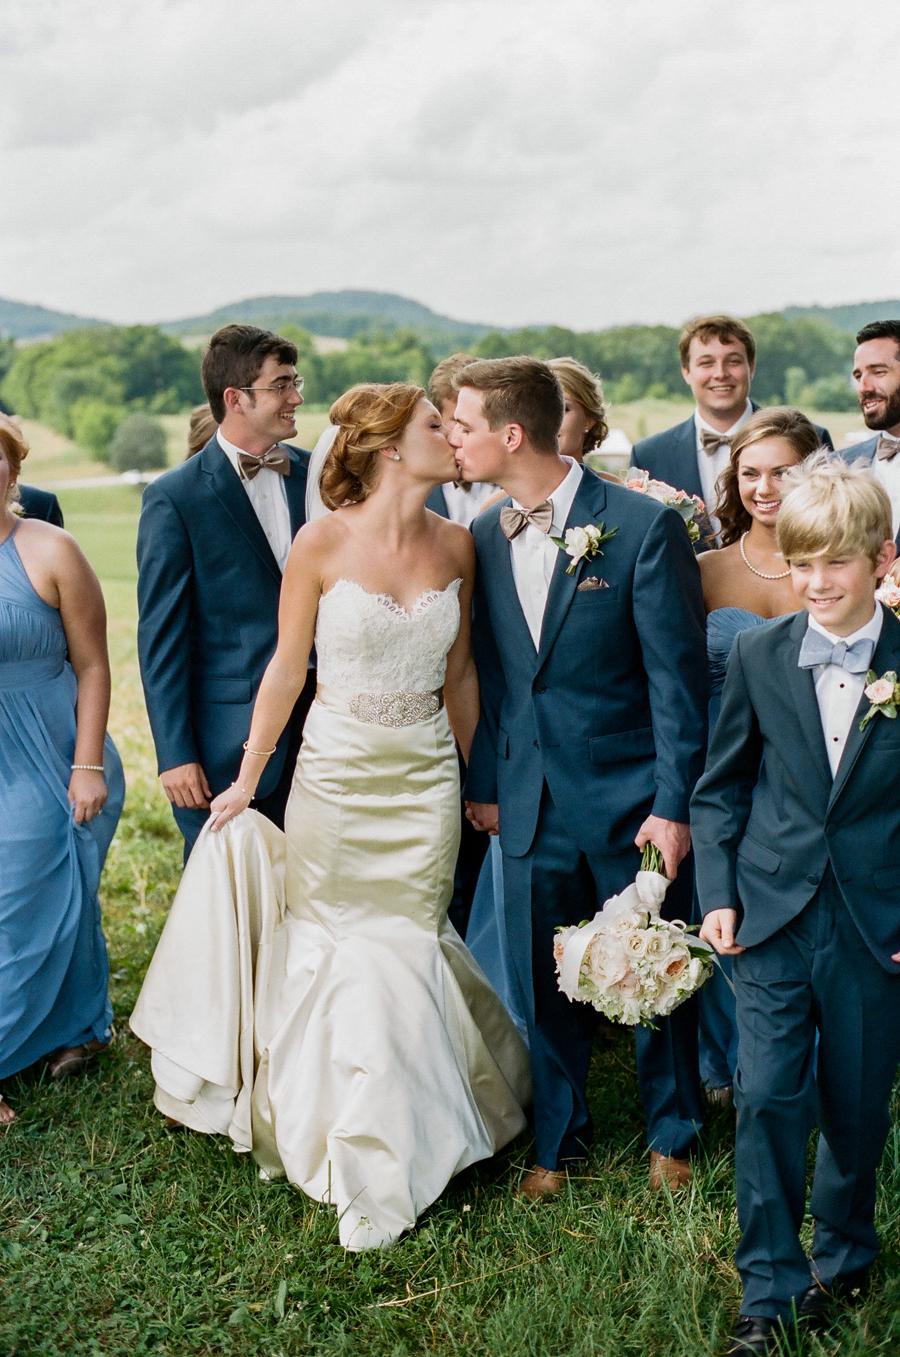 Nashville-wedding-photographer-best-wedding-photography-24.JPG